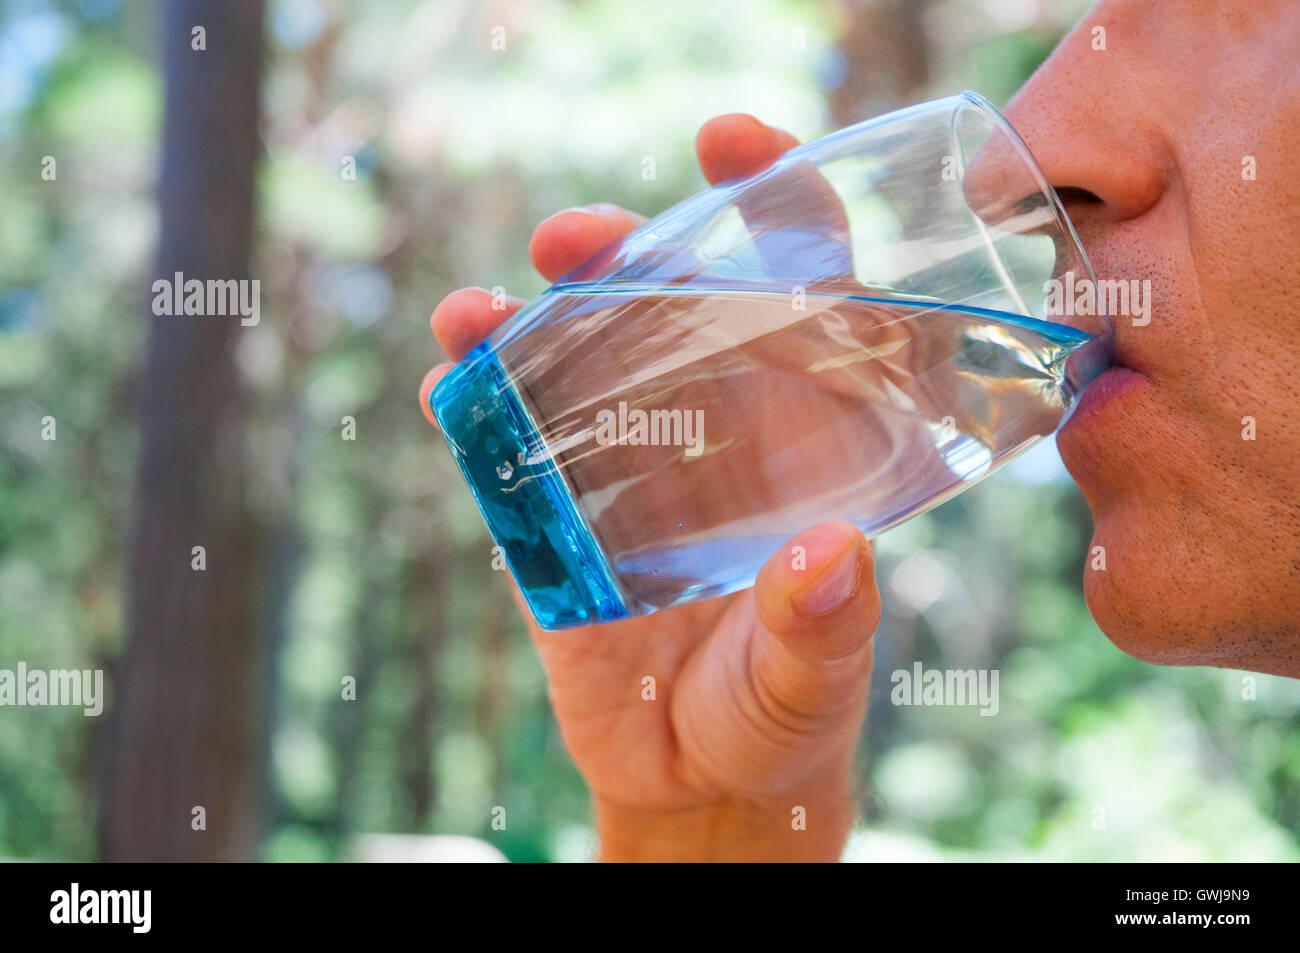 Hombre beber un vaso de agua. Cerrar vista. Imagen De Stock